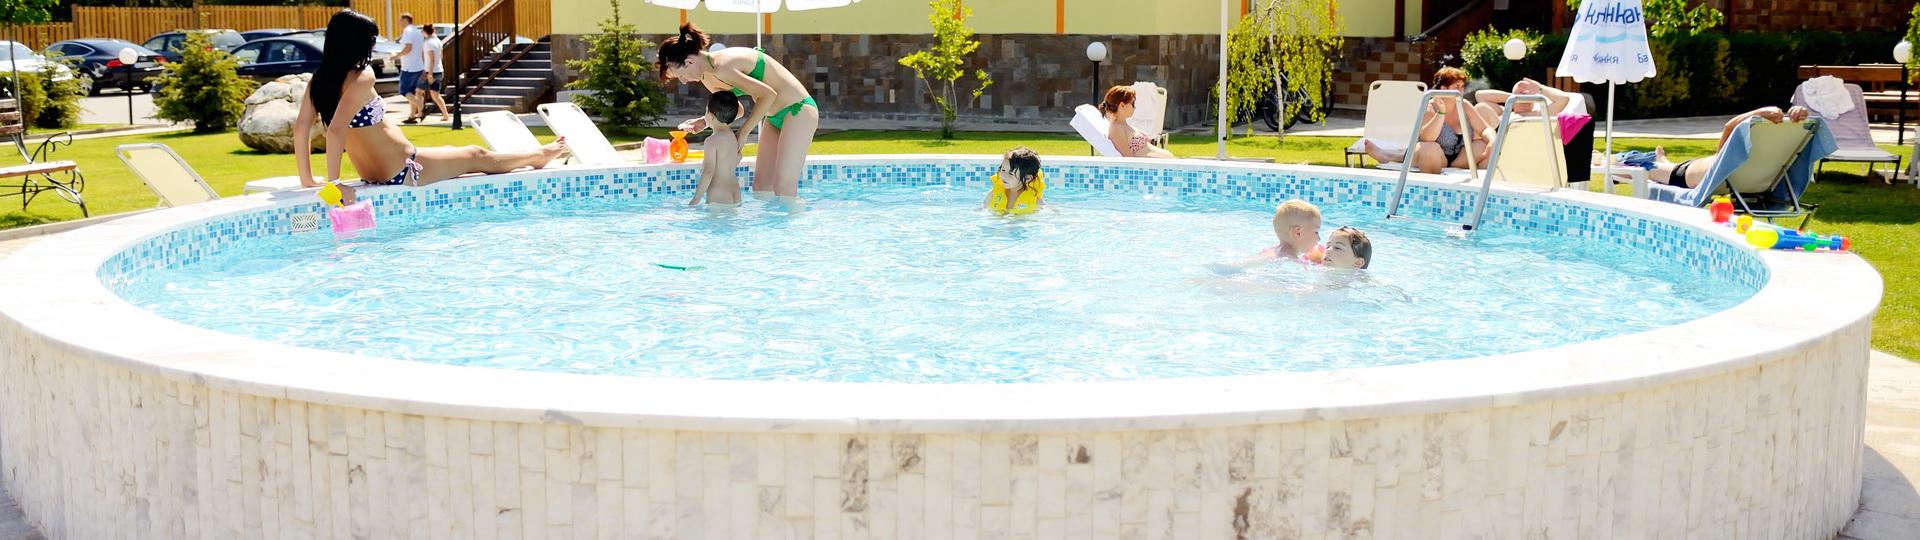 Child_Pool_02